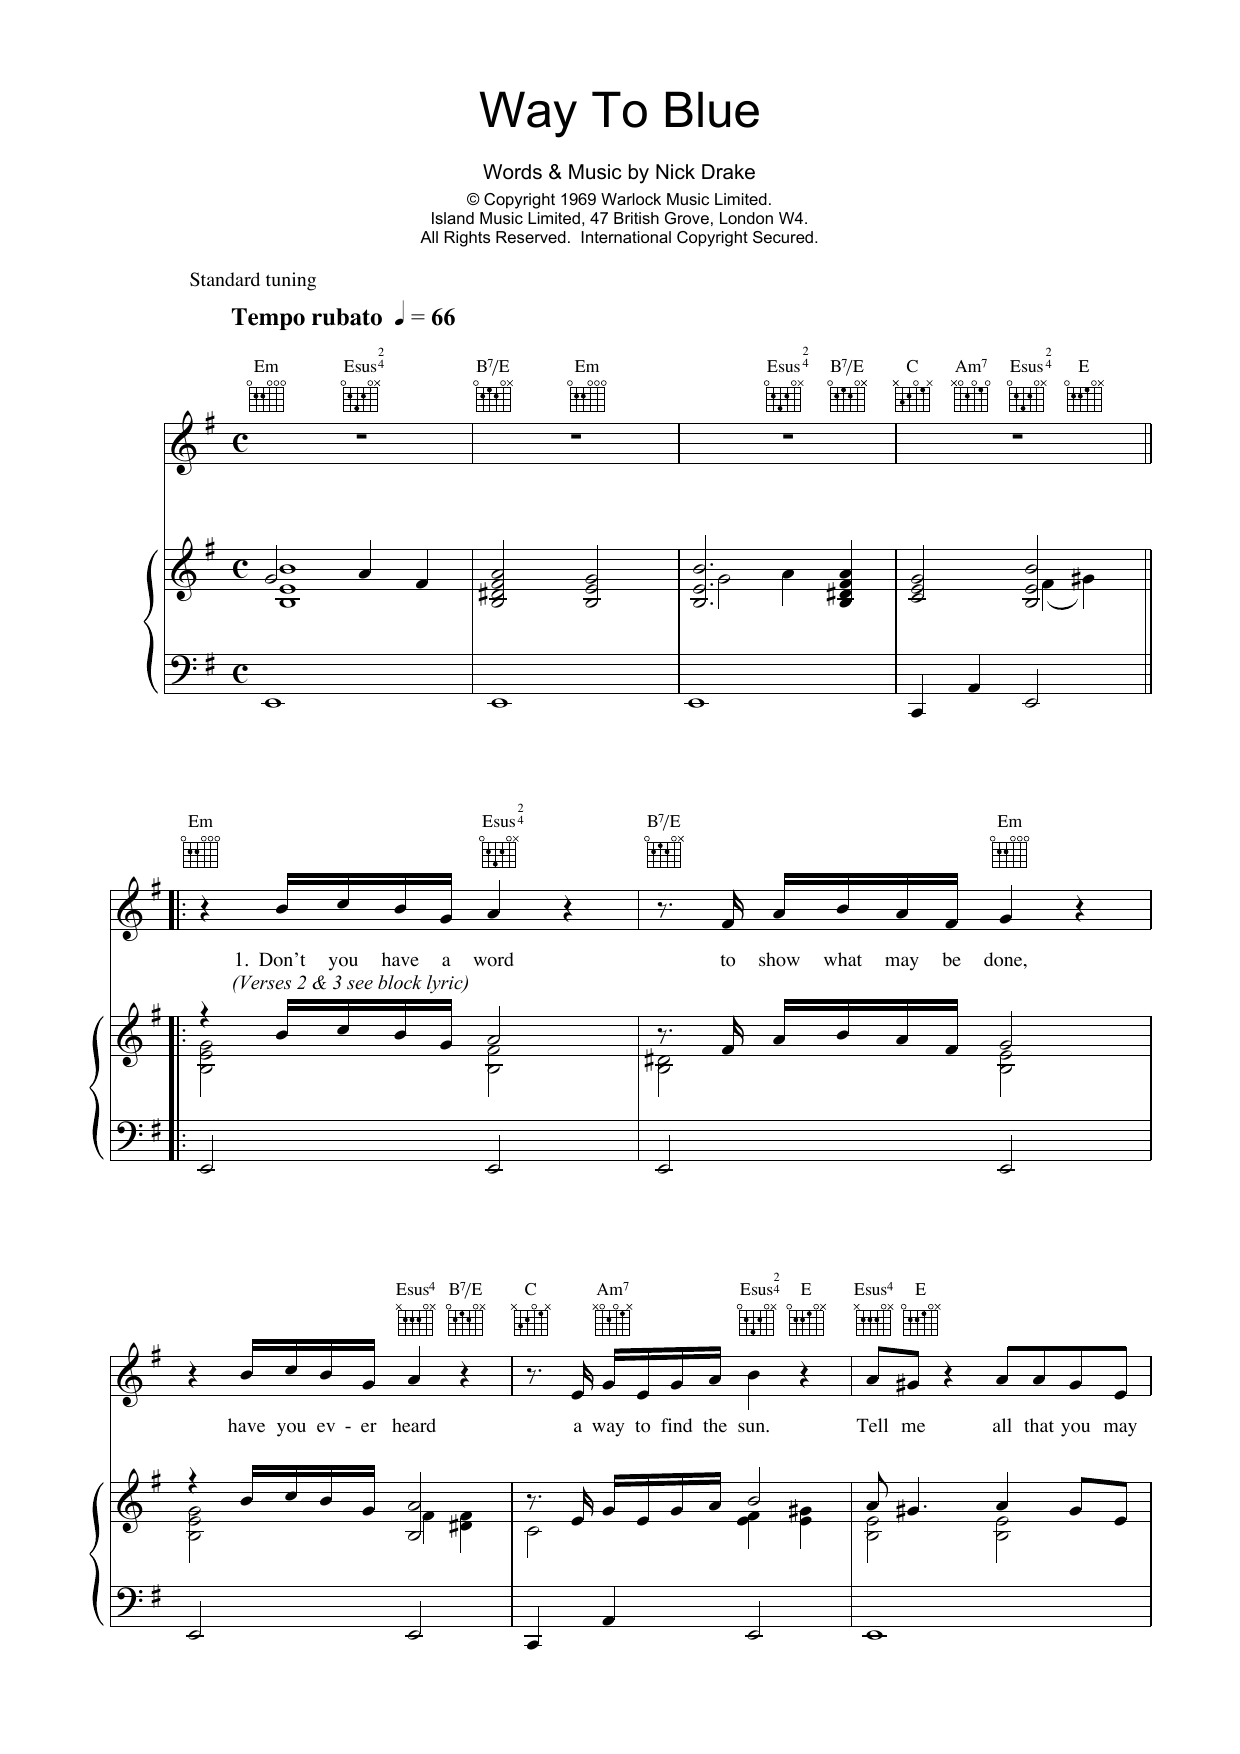 Way To Blue Sheet Music